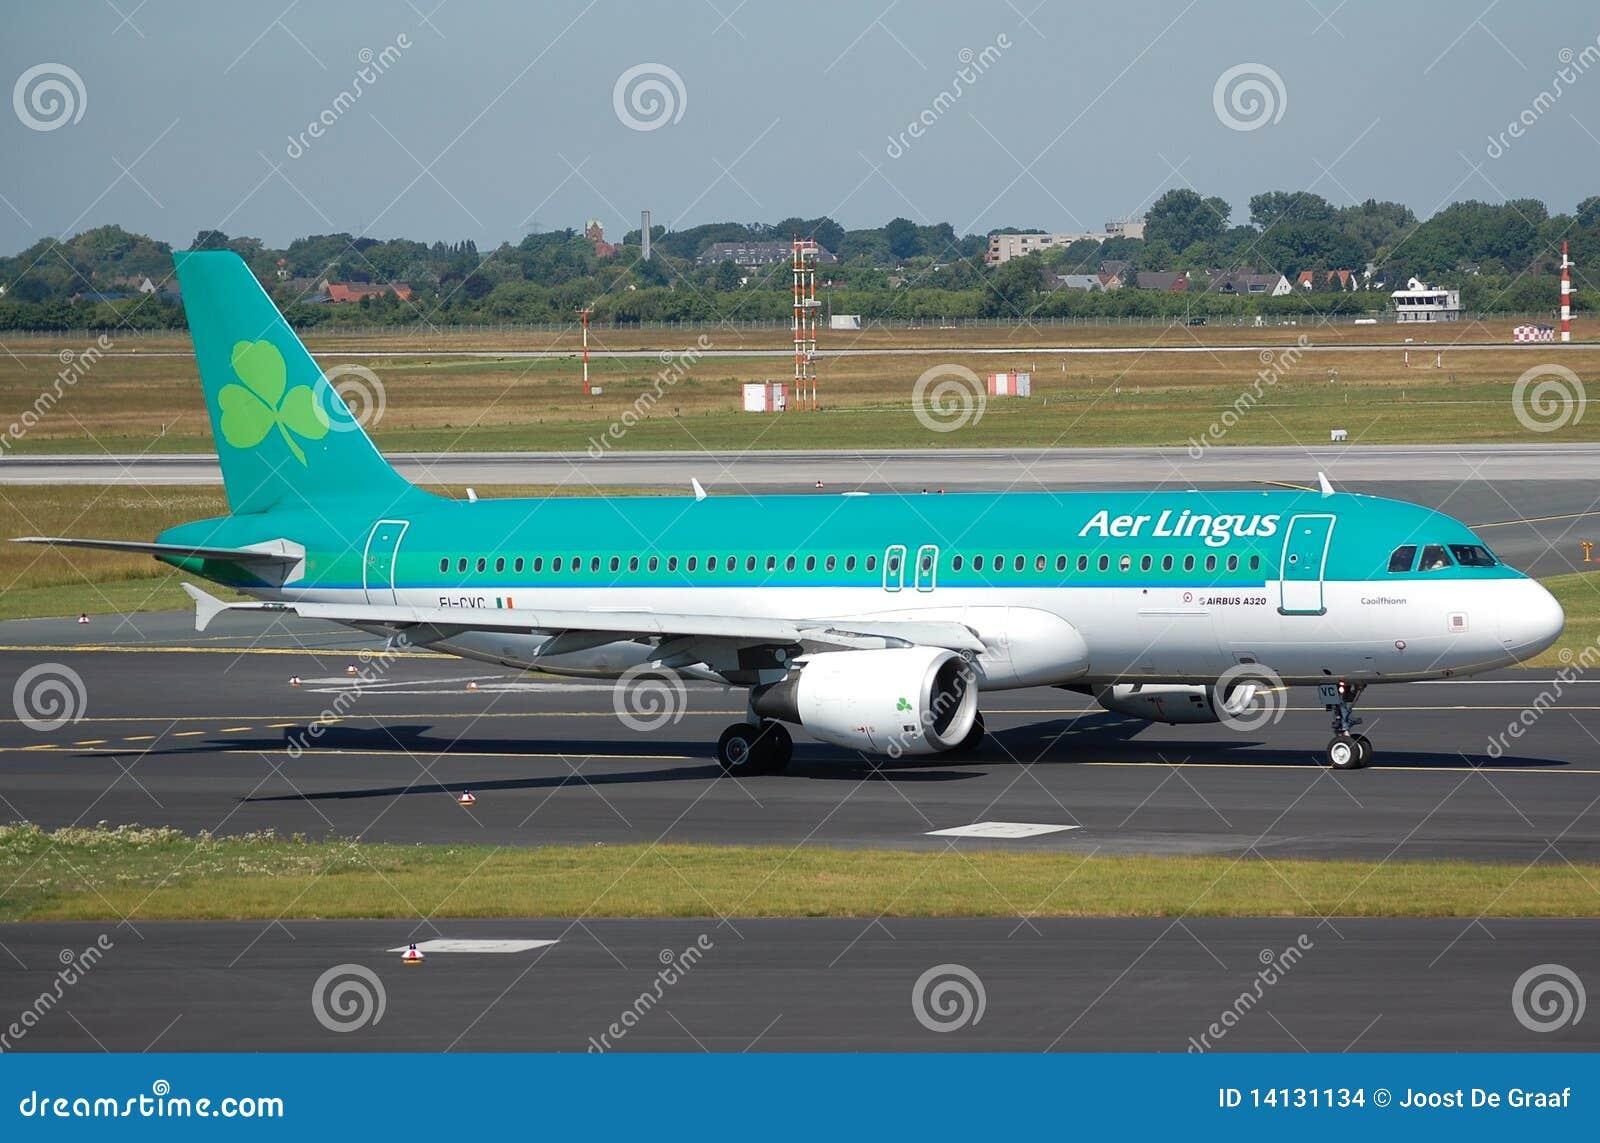 Lingus airbus 320 aer